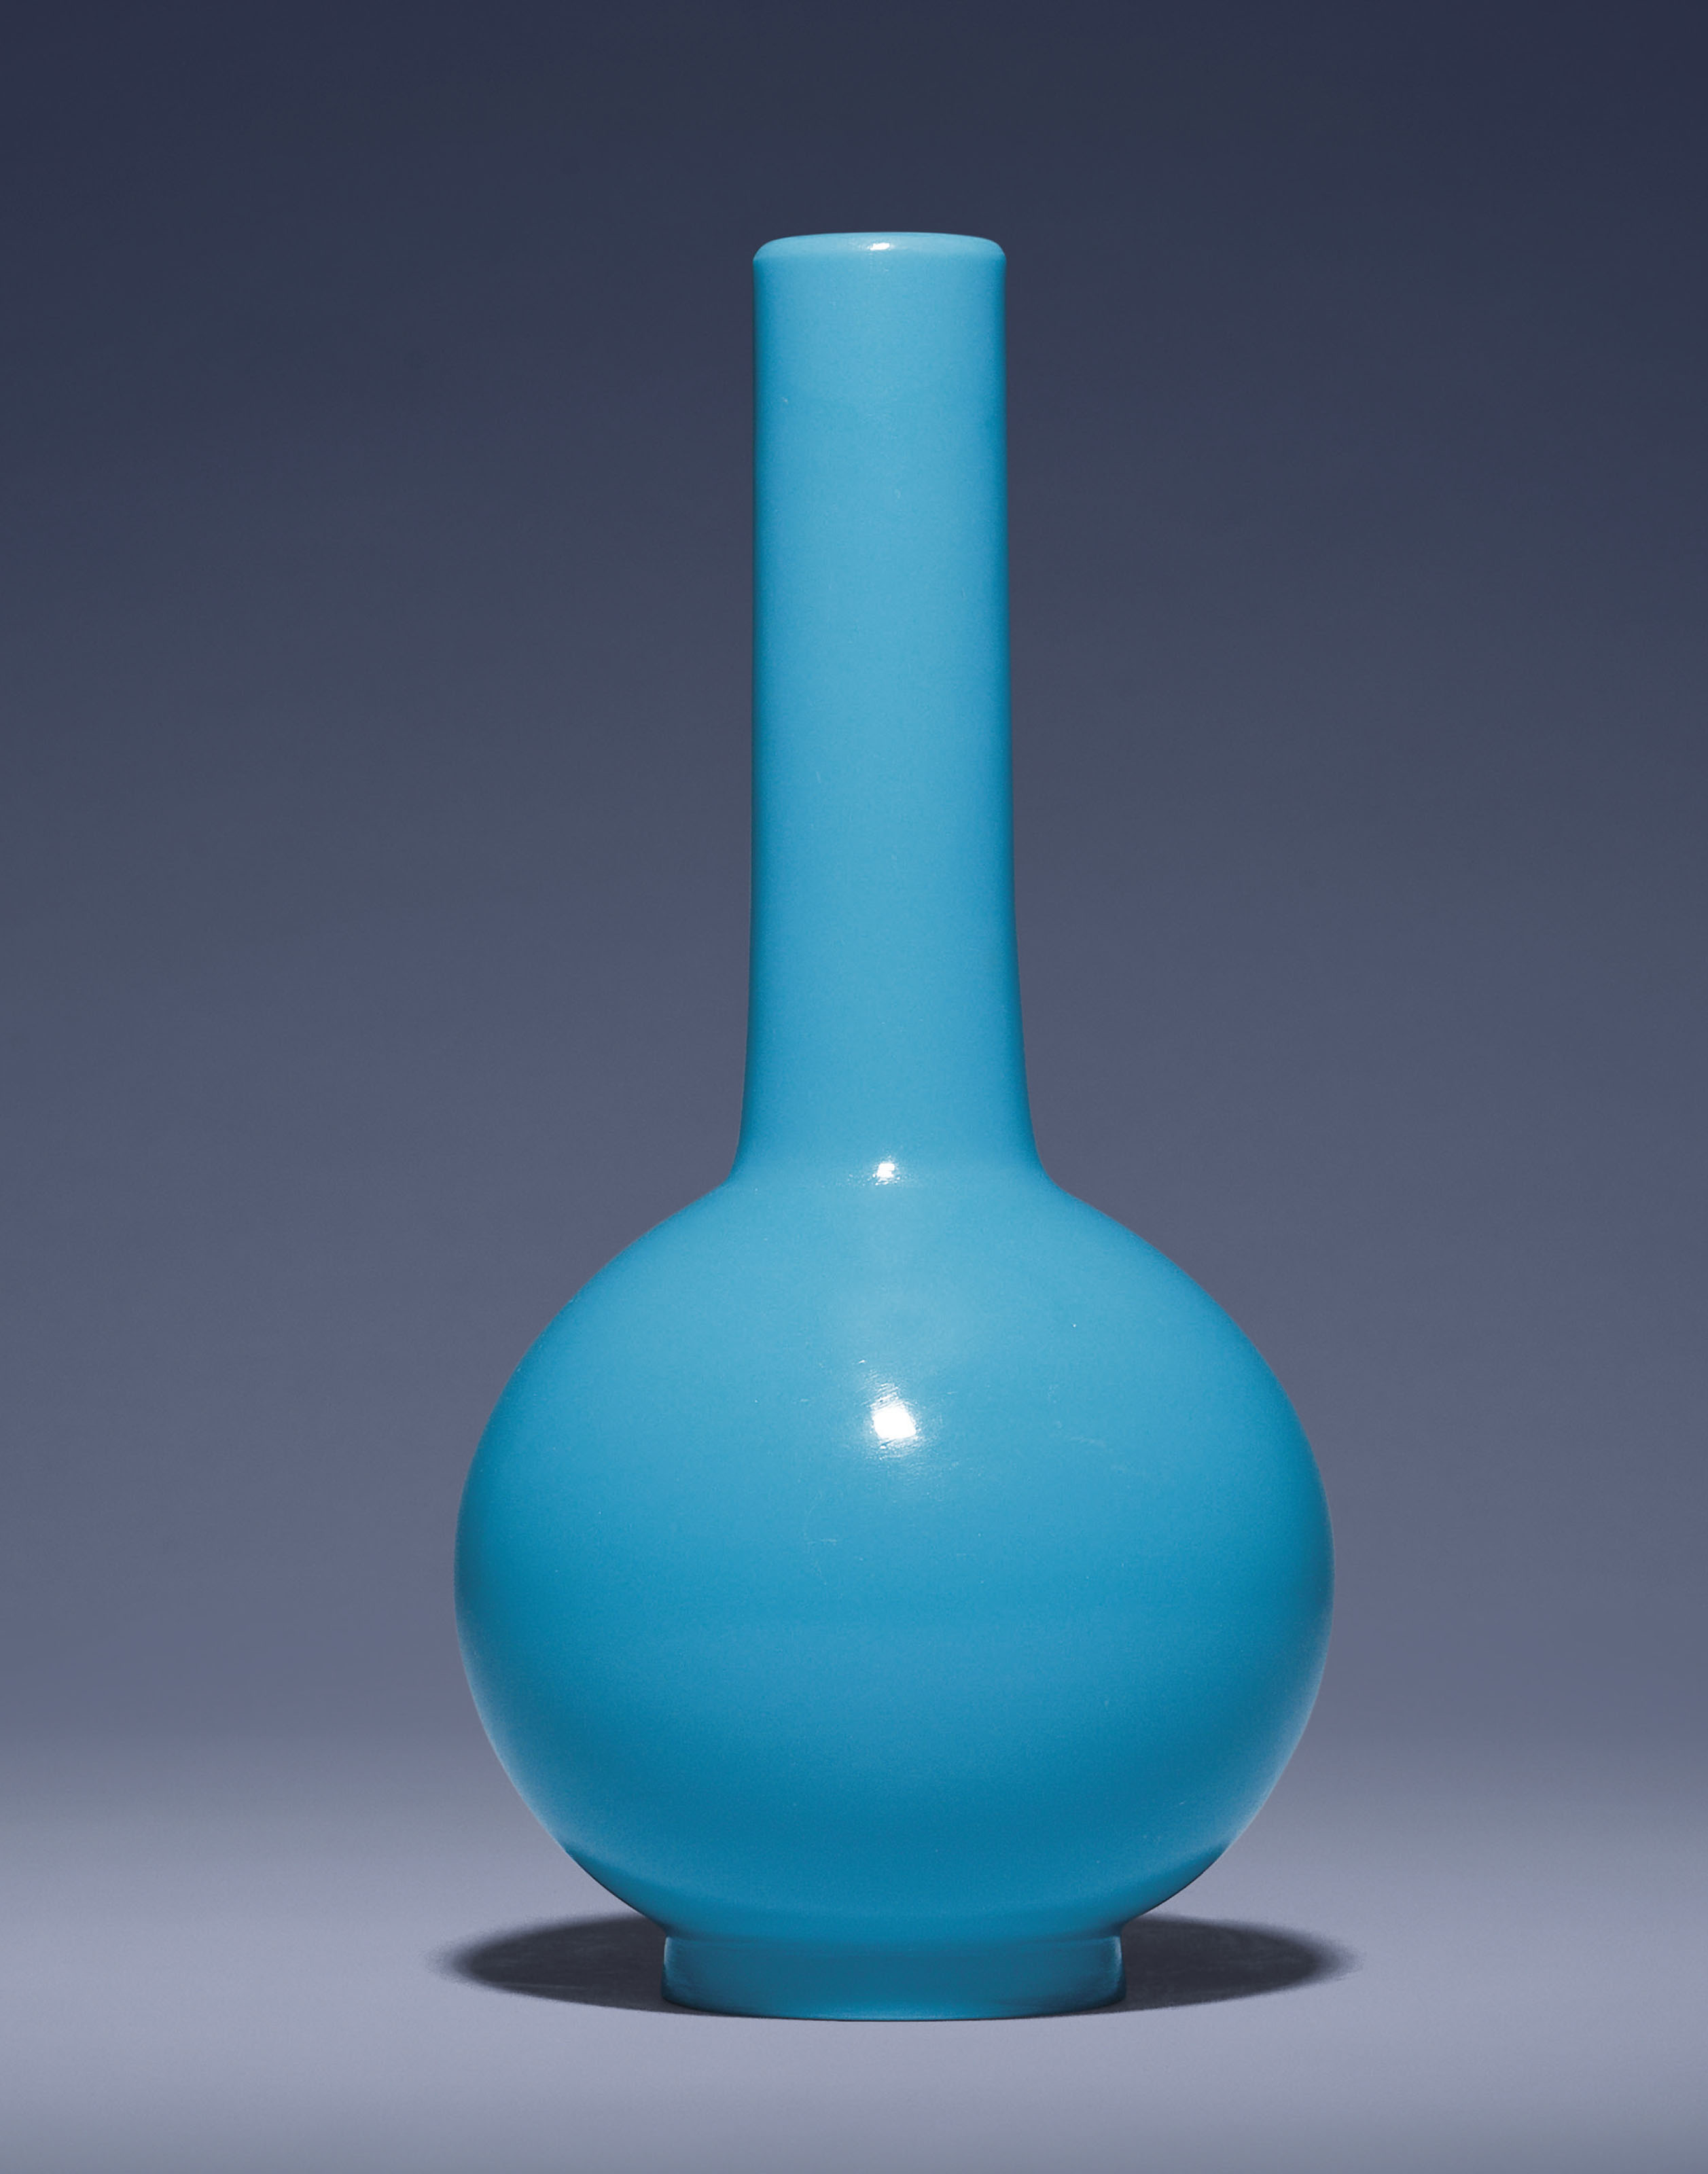 A BLUE GLASS BOTTLE VASE